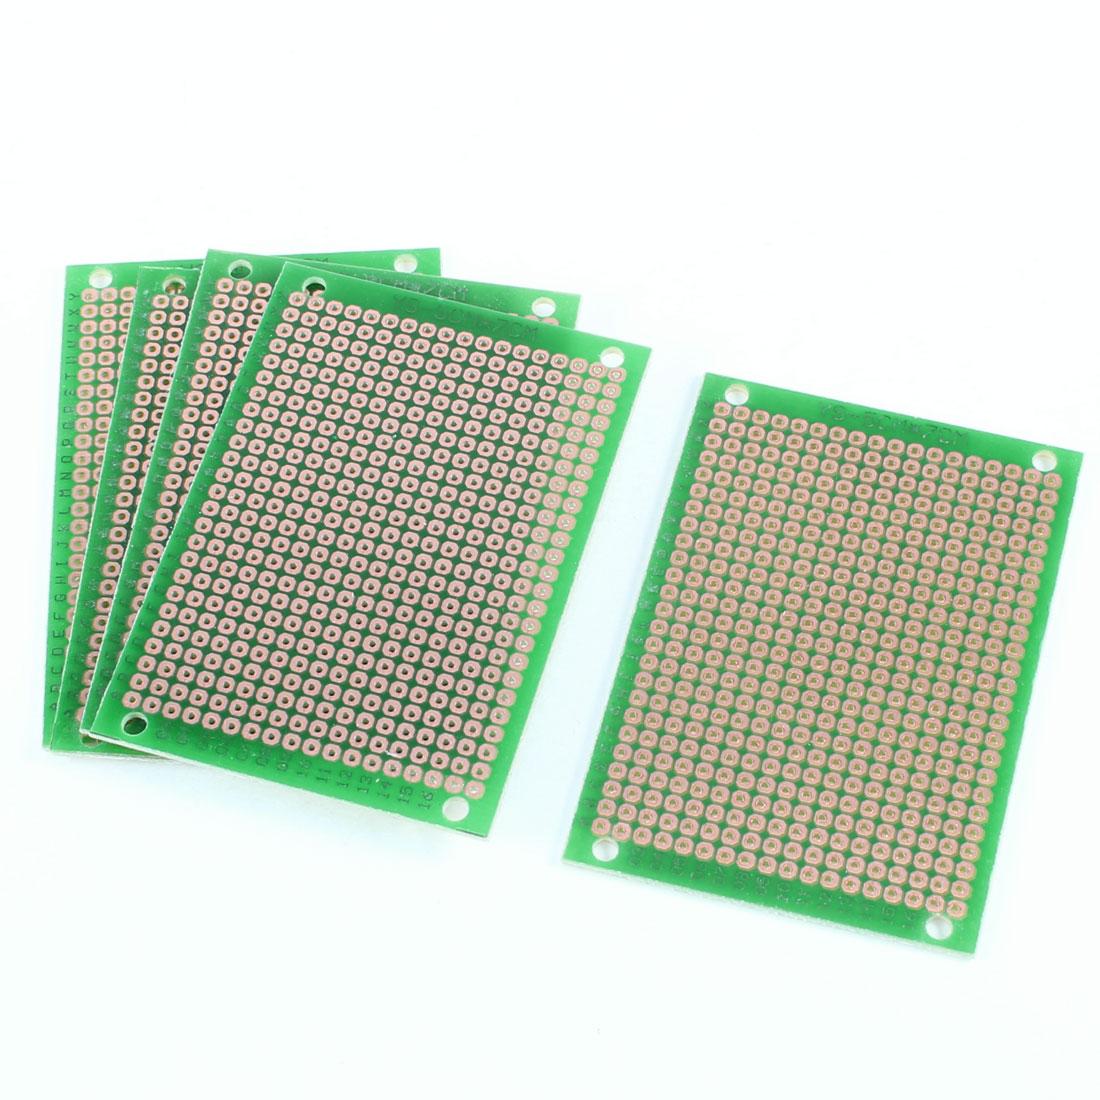 5pcs 5cm x 7cm Solderable Prototype Universal PCB Circuit Board